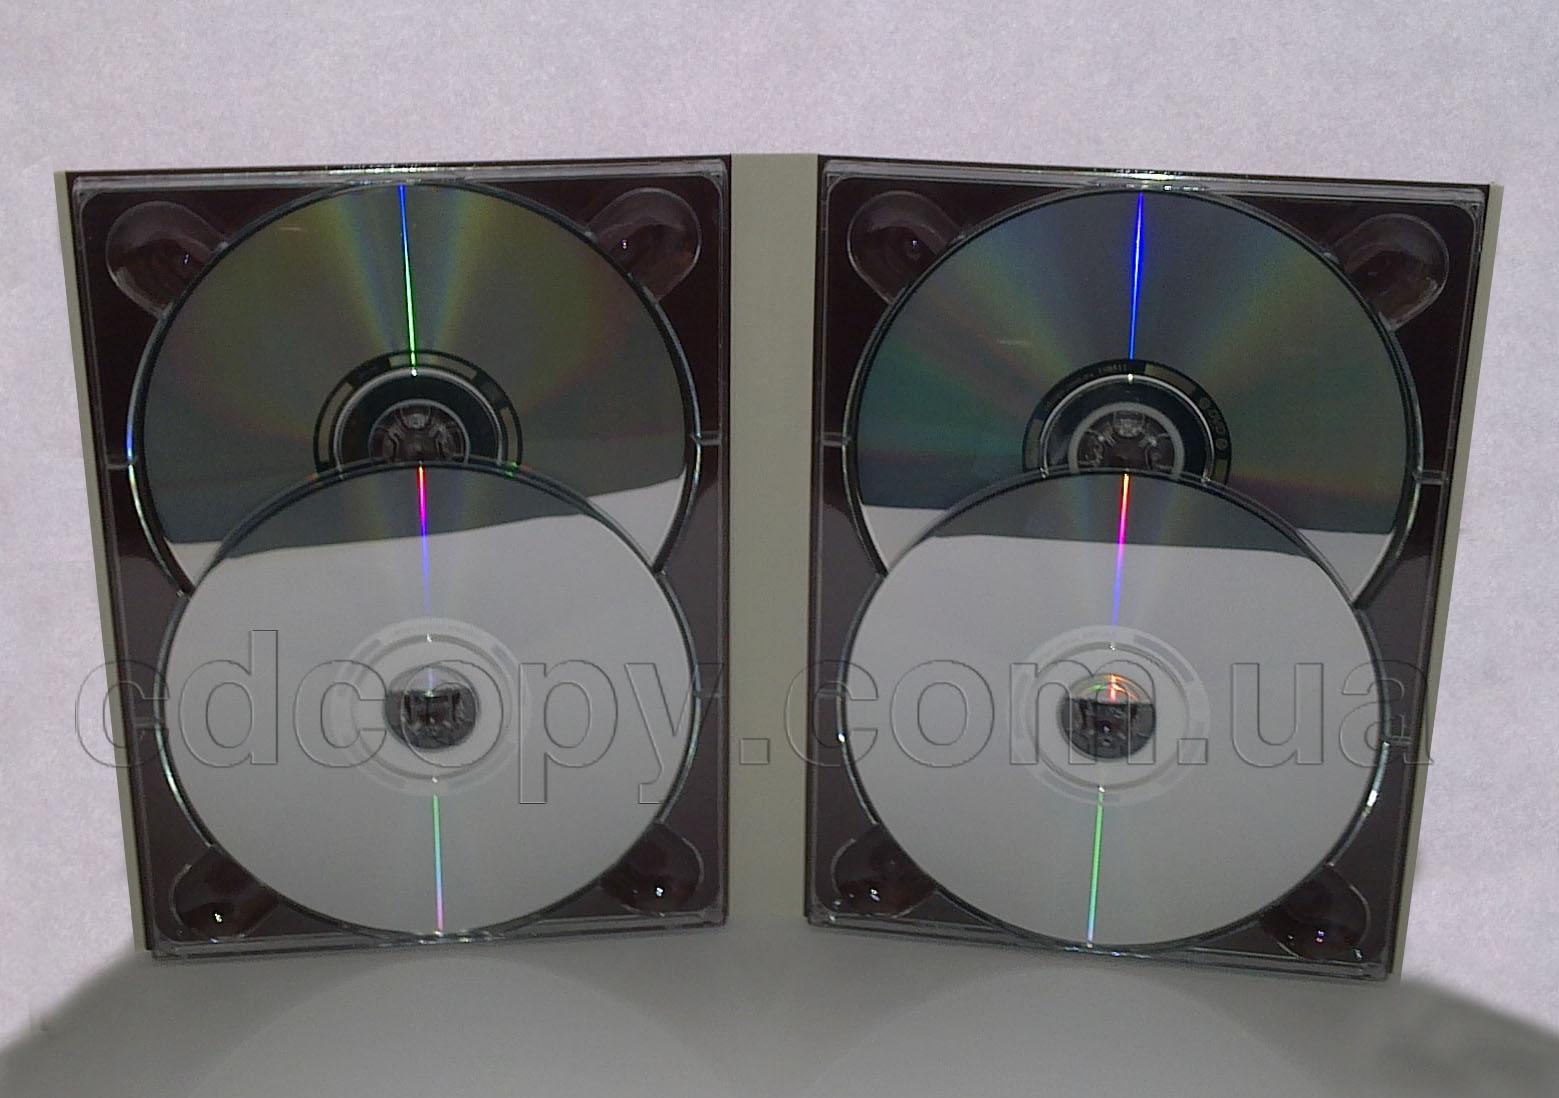 Упаковка Диджипак (DigiPack) на 4 DVD